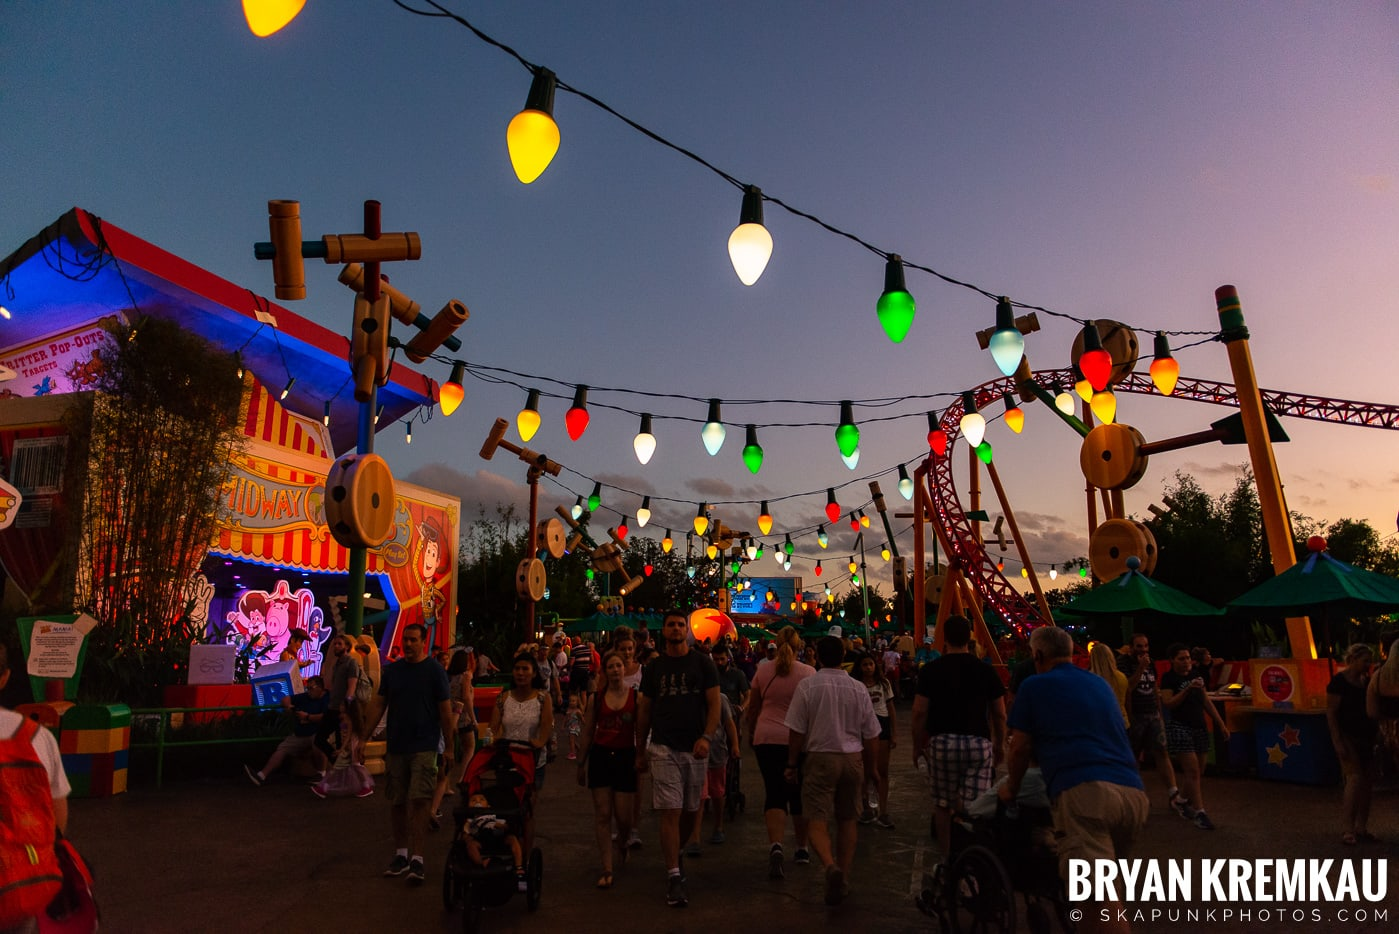 Walt Disney World Vacation: Day 5 (Animal Kingdom / Disney's Hollywood Studios) - 10.3.19 (43)